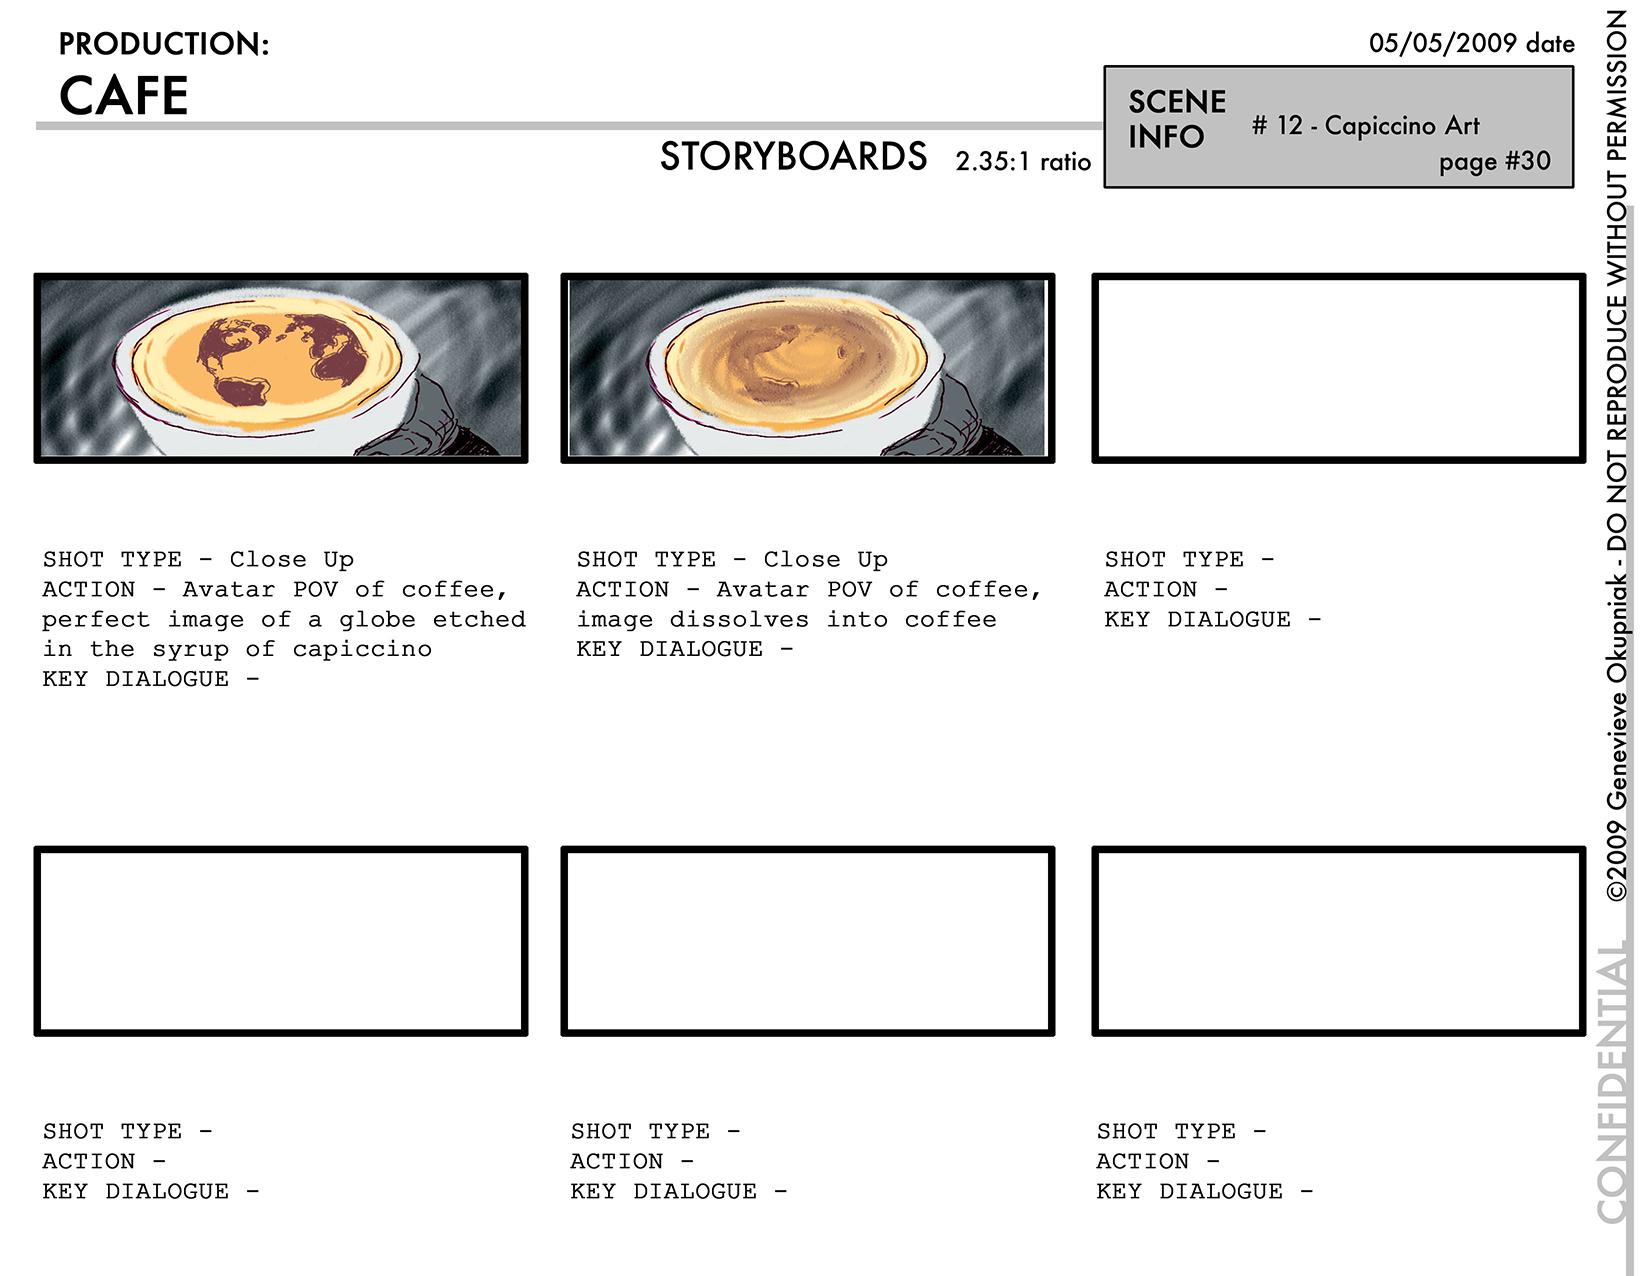 Storyboard_CAFE_12.jpg